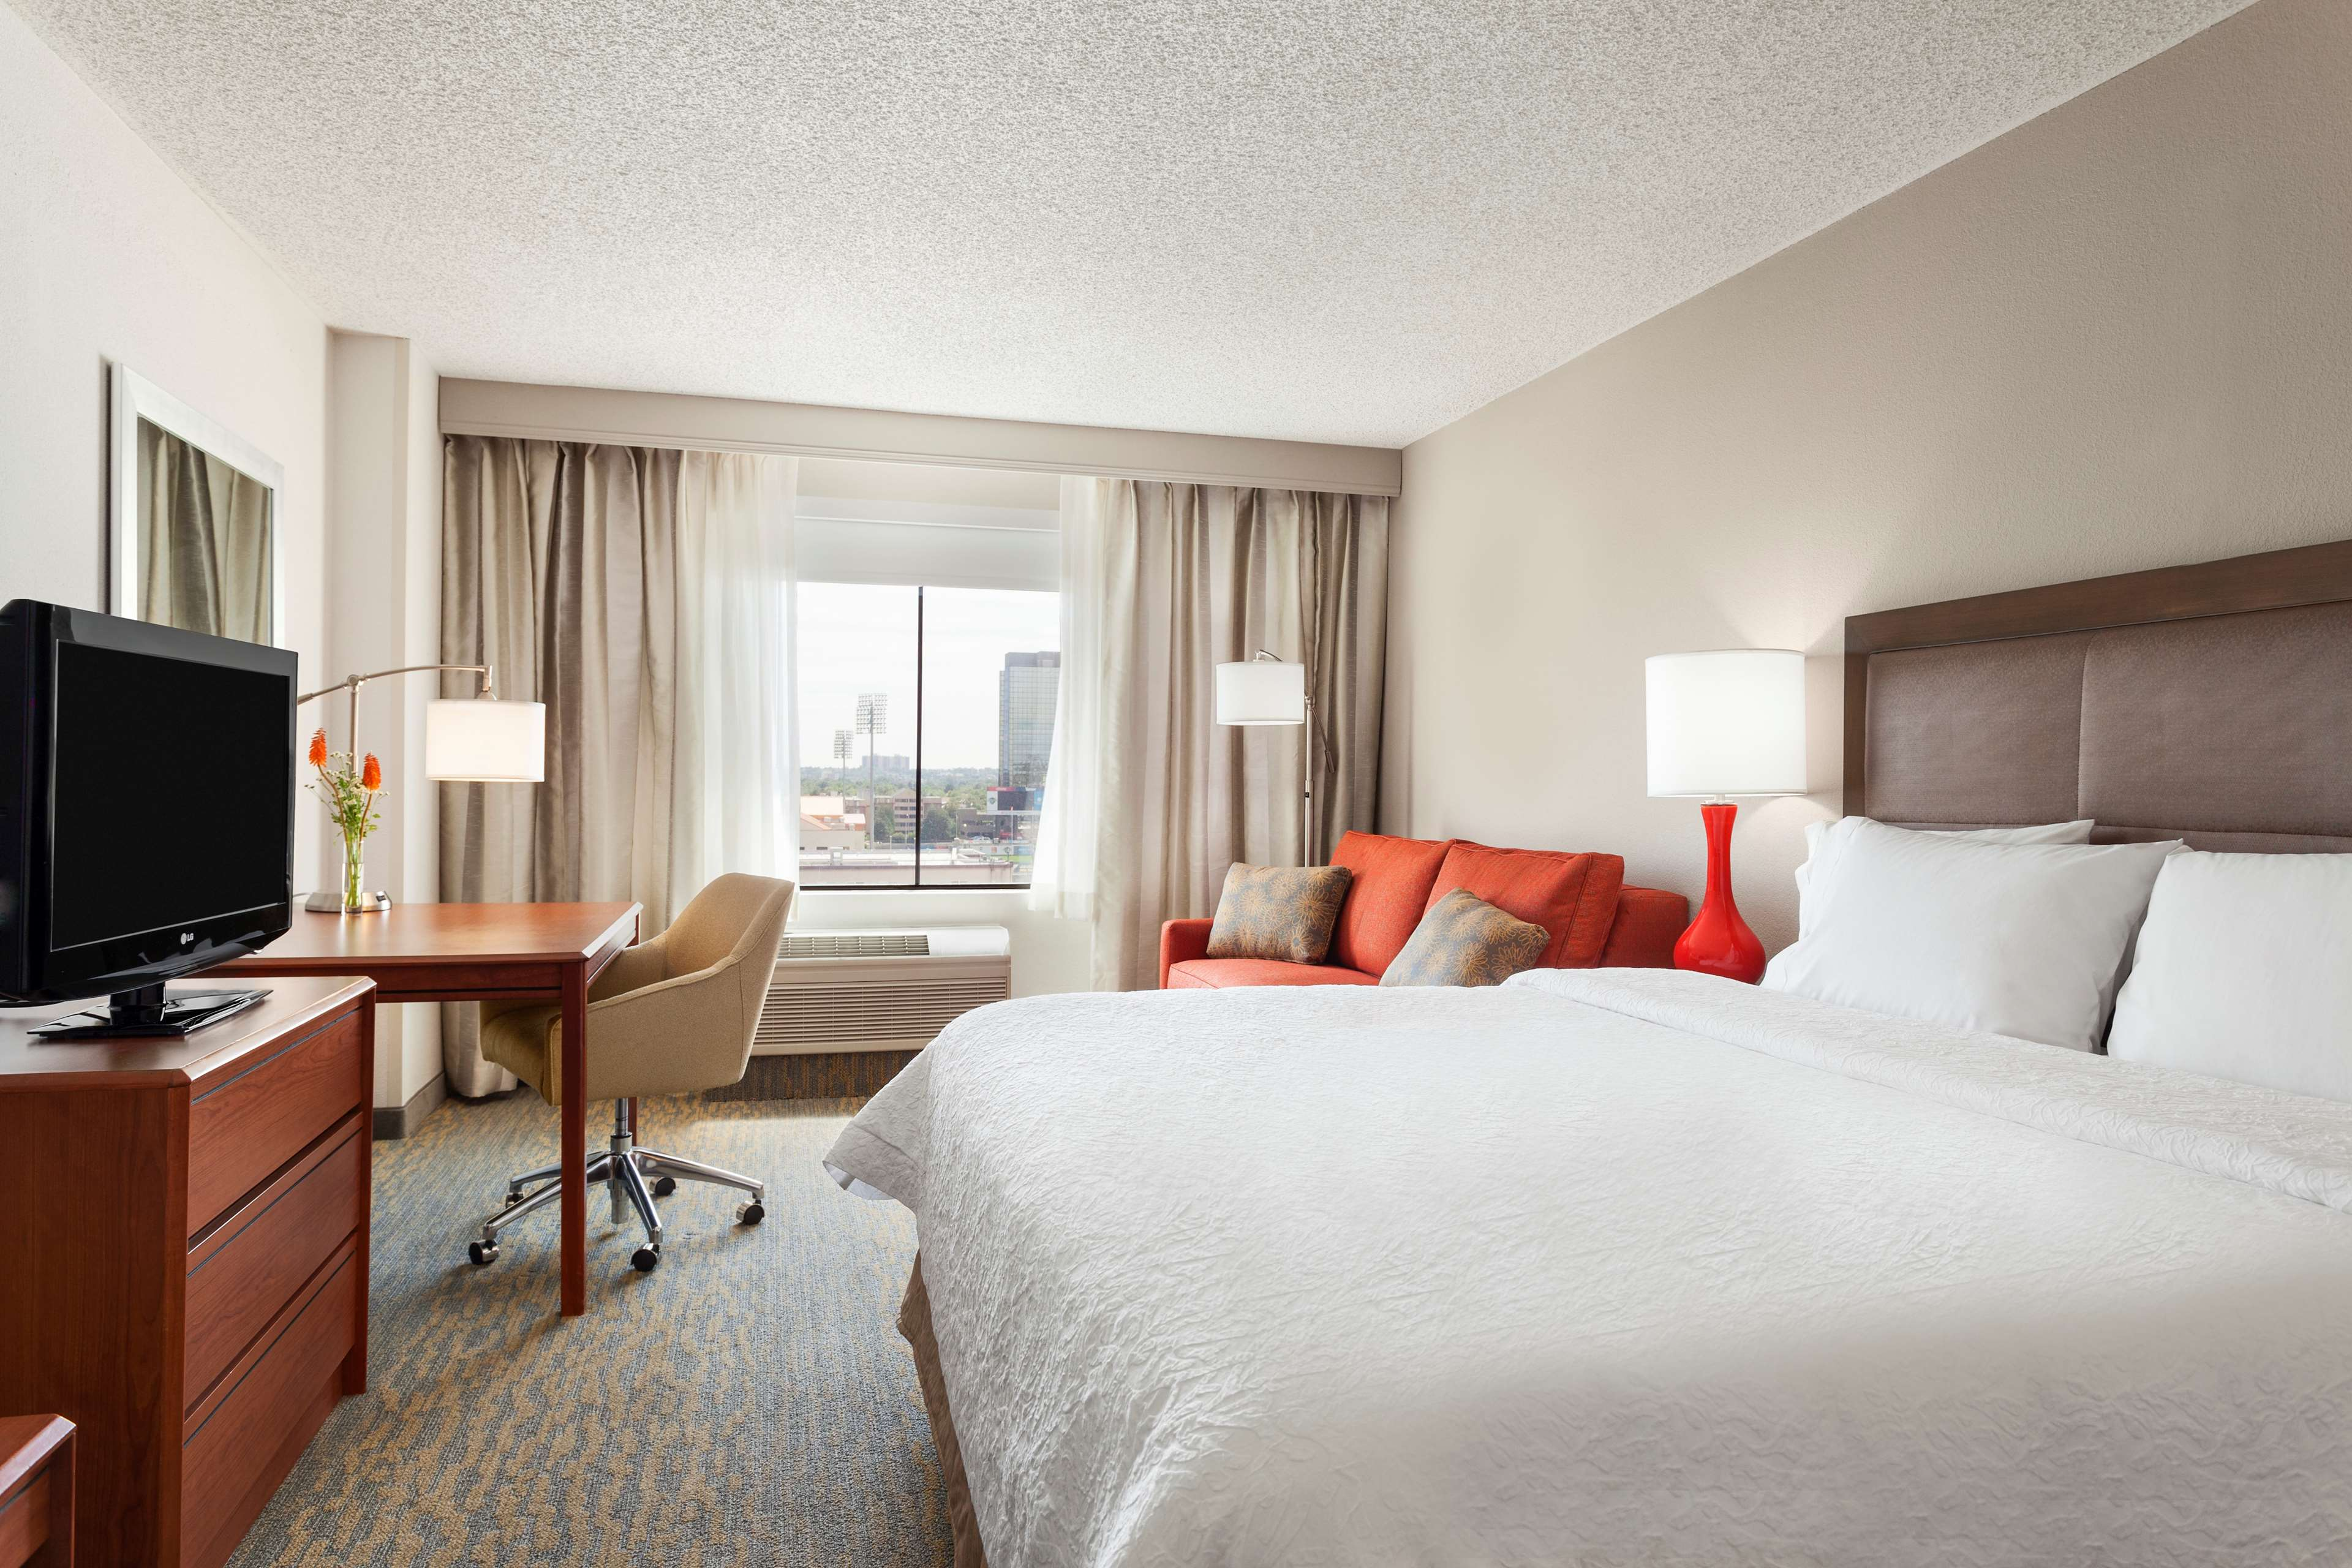 Hampton Inn & Suites Denver-Cherry Creek image 15